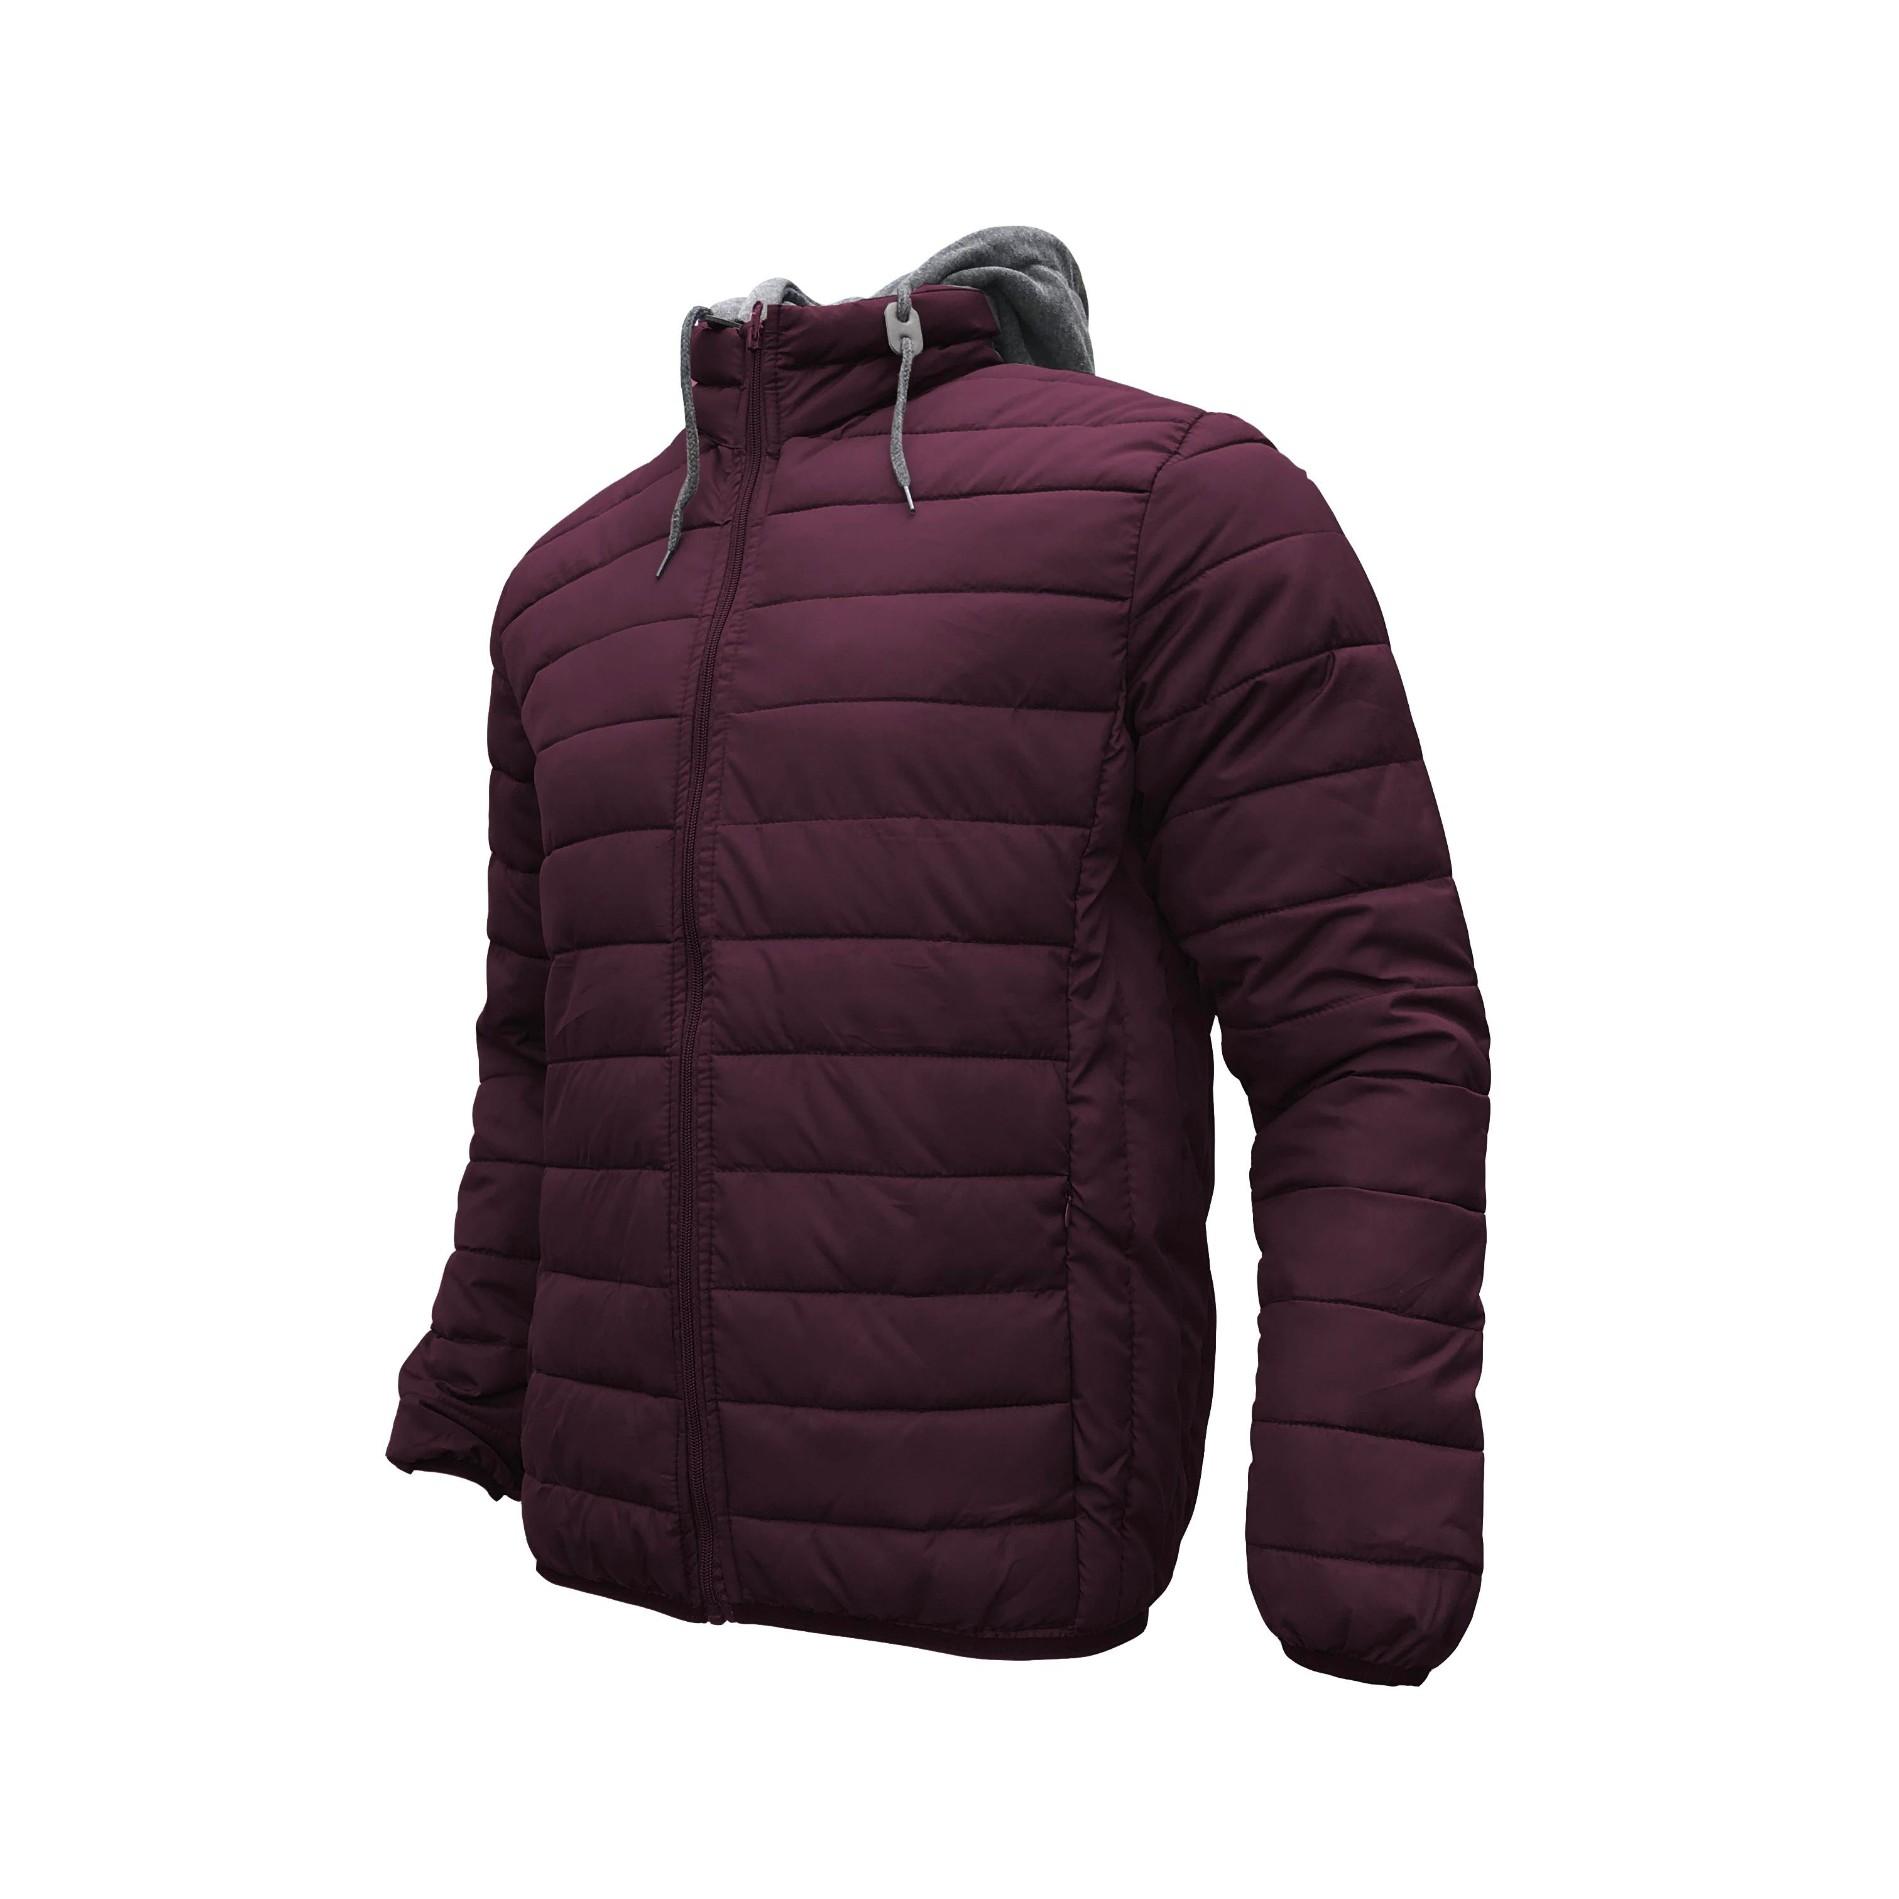 Men's Hooded Padding Jacket Winter Zipper Quilted Coat Manufacturers, Men's Hooded Padding Jacket Winter Zipper Quilted Coat Factory, Supply Men's Hooded Padding Jacket Winter Zipper Quilted Coat